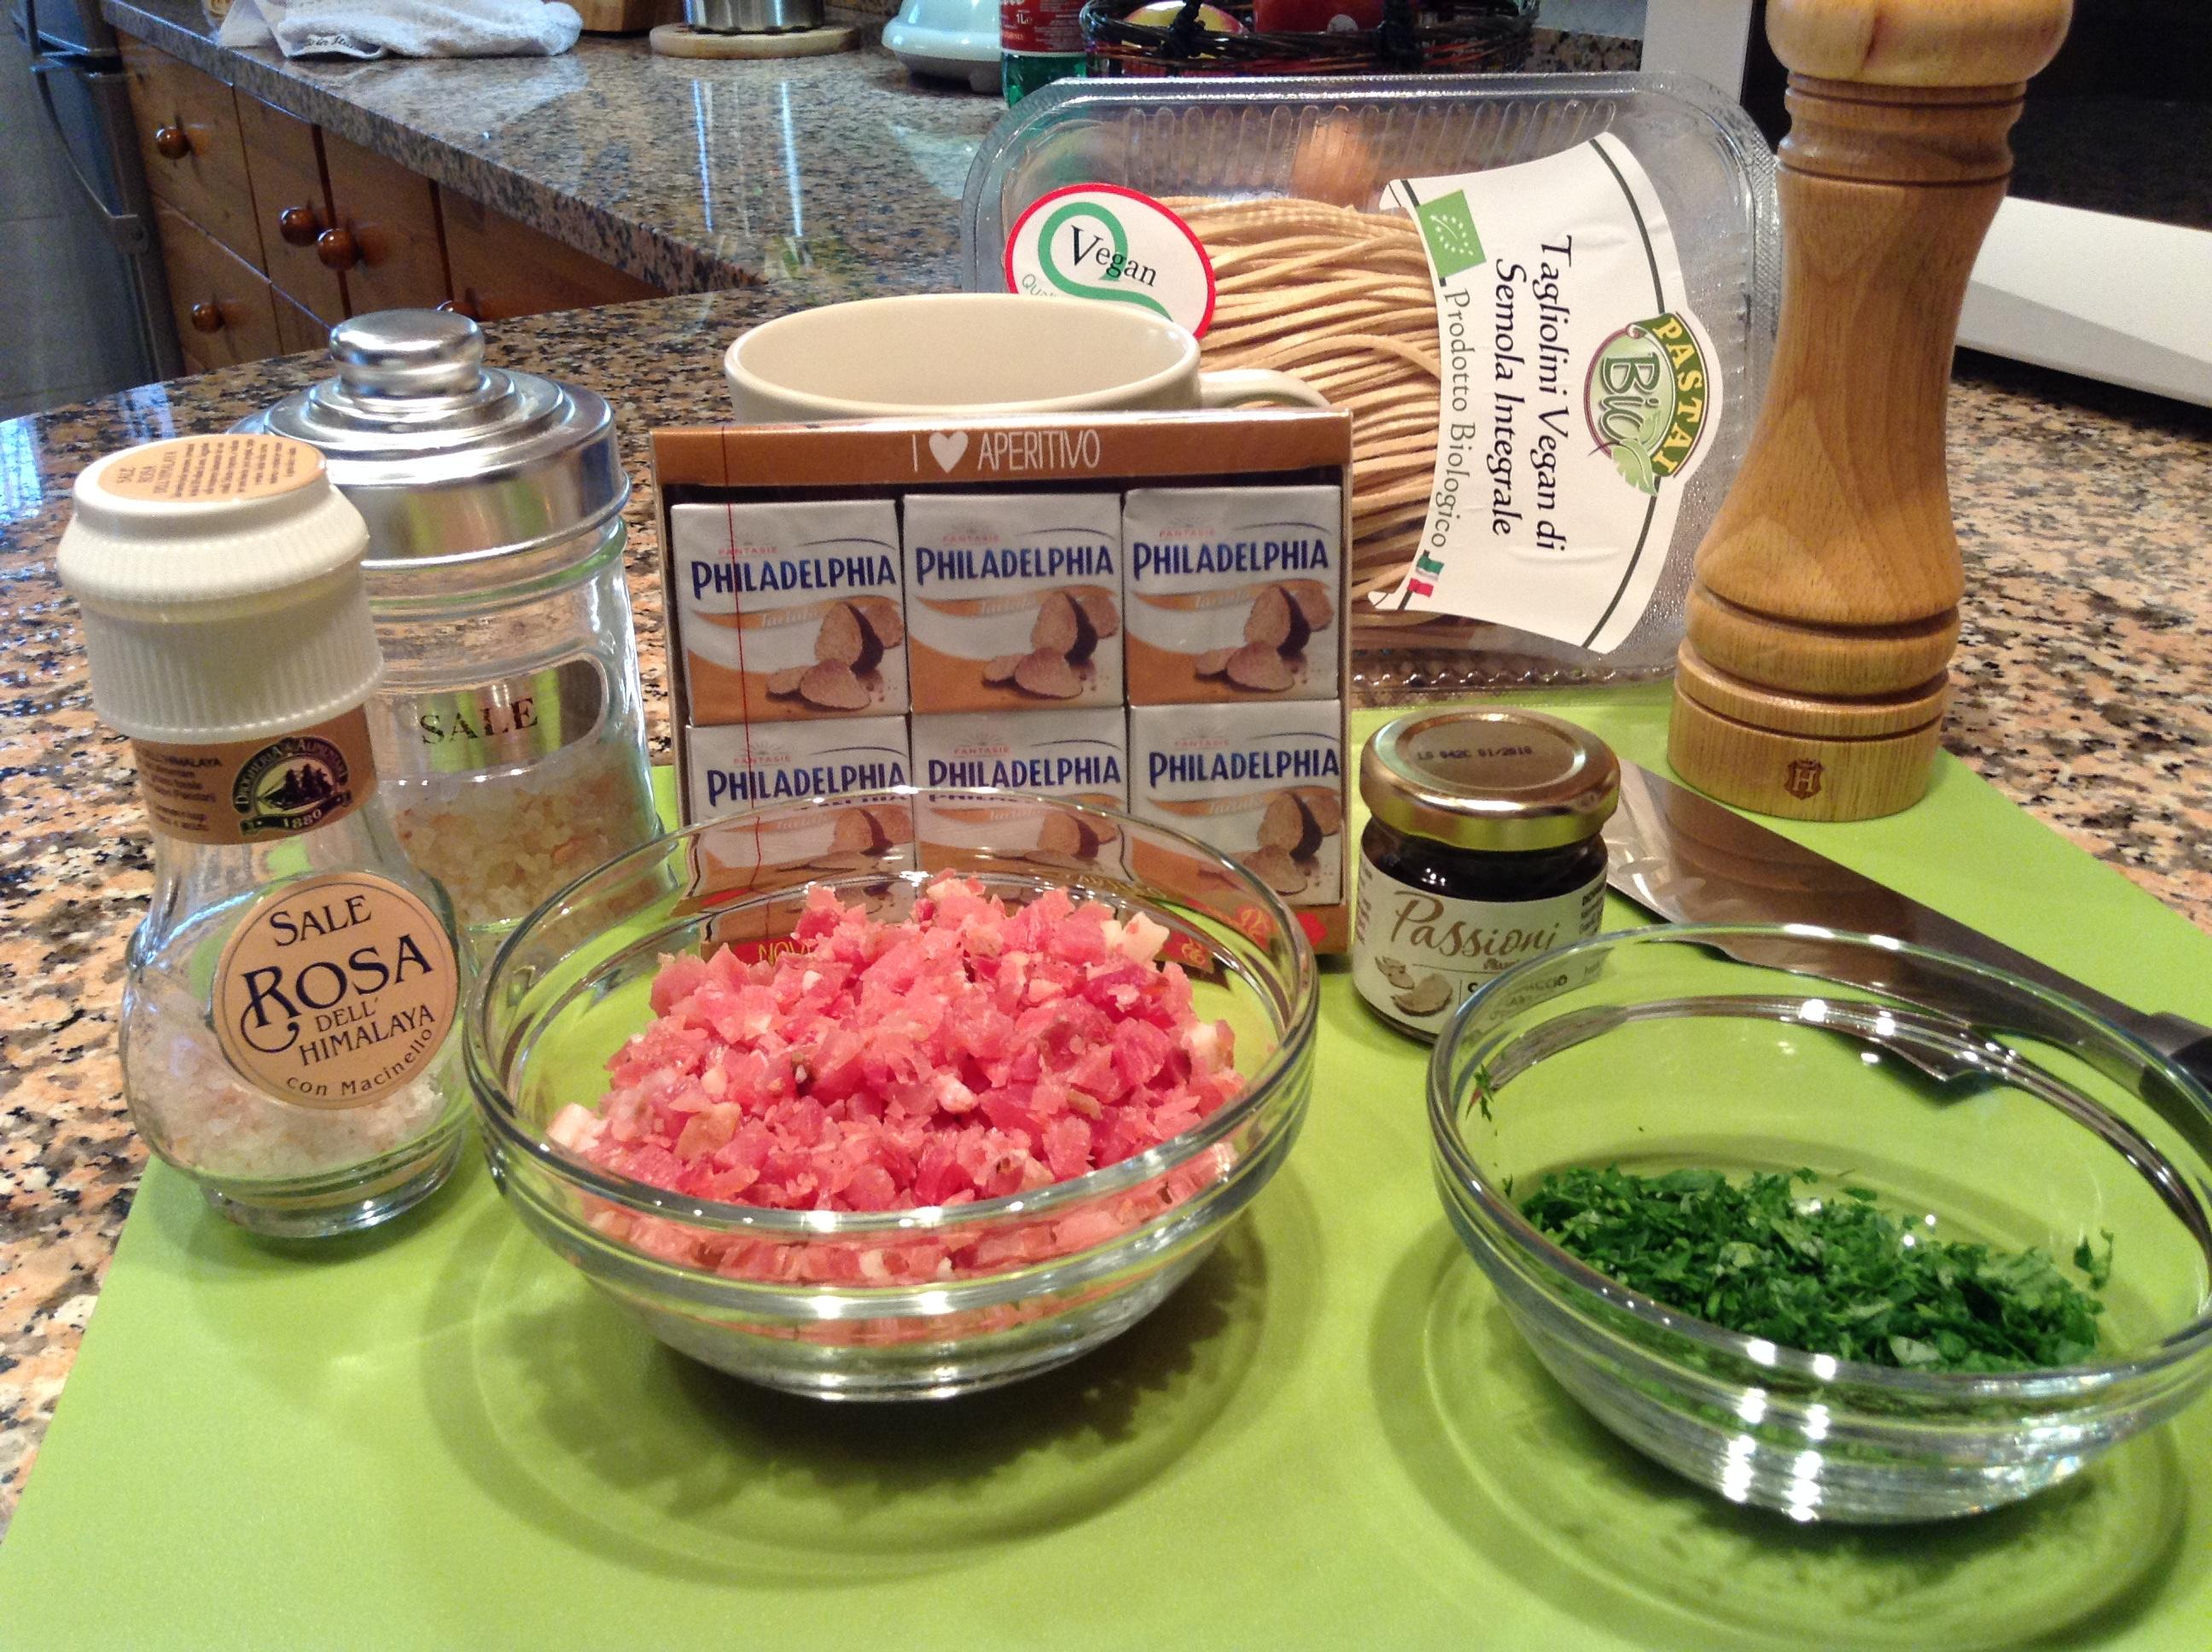 Ricette di pasta con philadelphia al tartufo